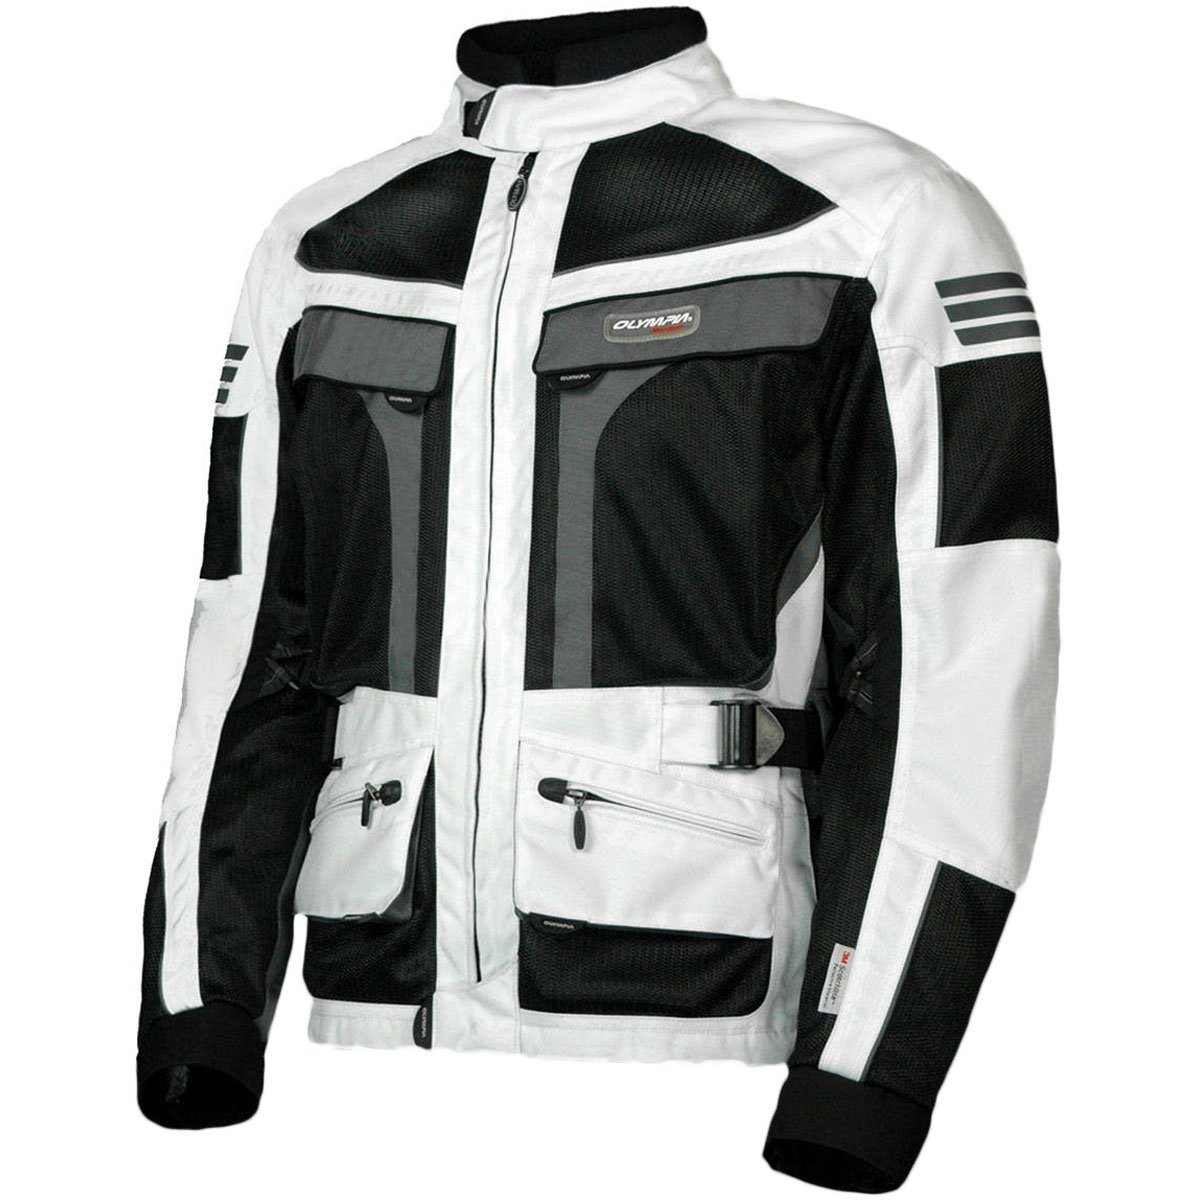 Olympia Moto Sports MJ222 Men's Dakar Dual Sport Mesh Tech Jacket (Ivory/Black, Large)